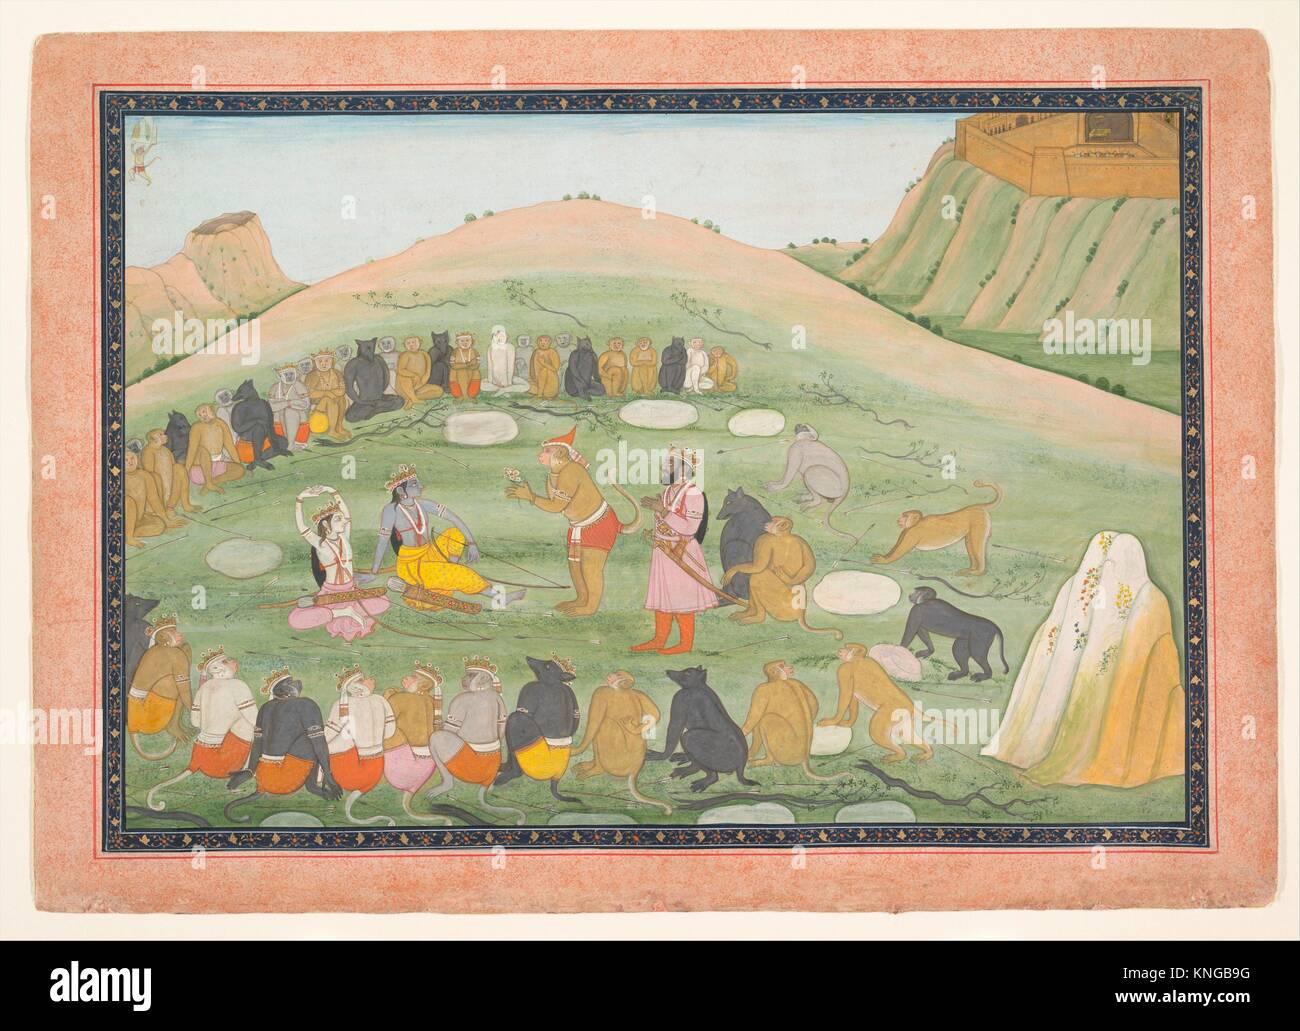 Hanuman Revives Rama and Lakshmana with Medicinal Herbs. Artist: Workshop active in the generation after Nainsukh - Stock Image